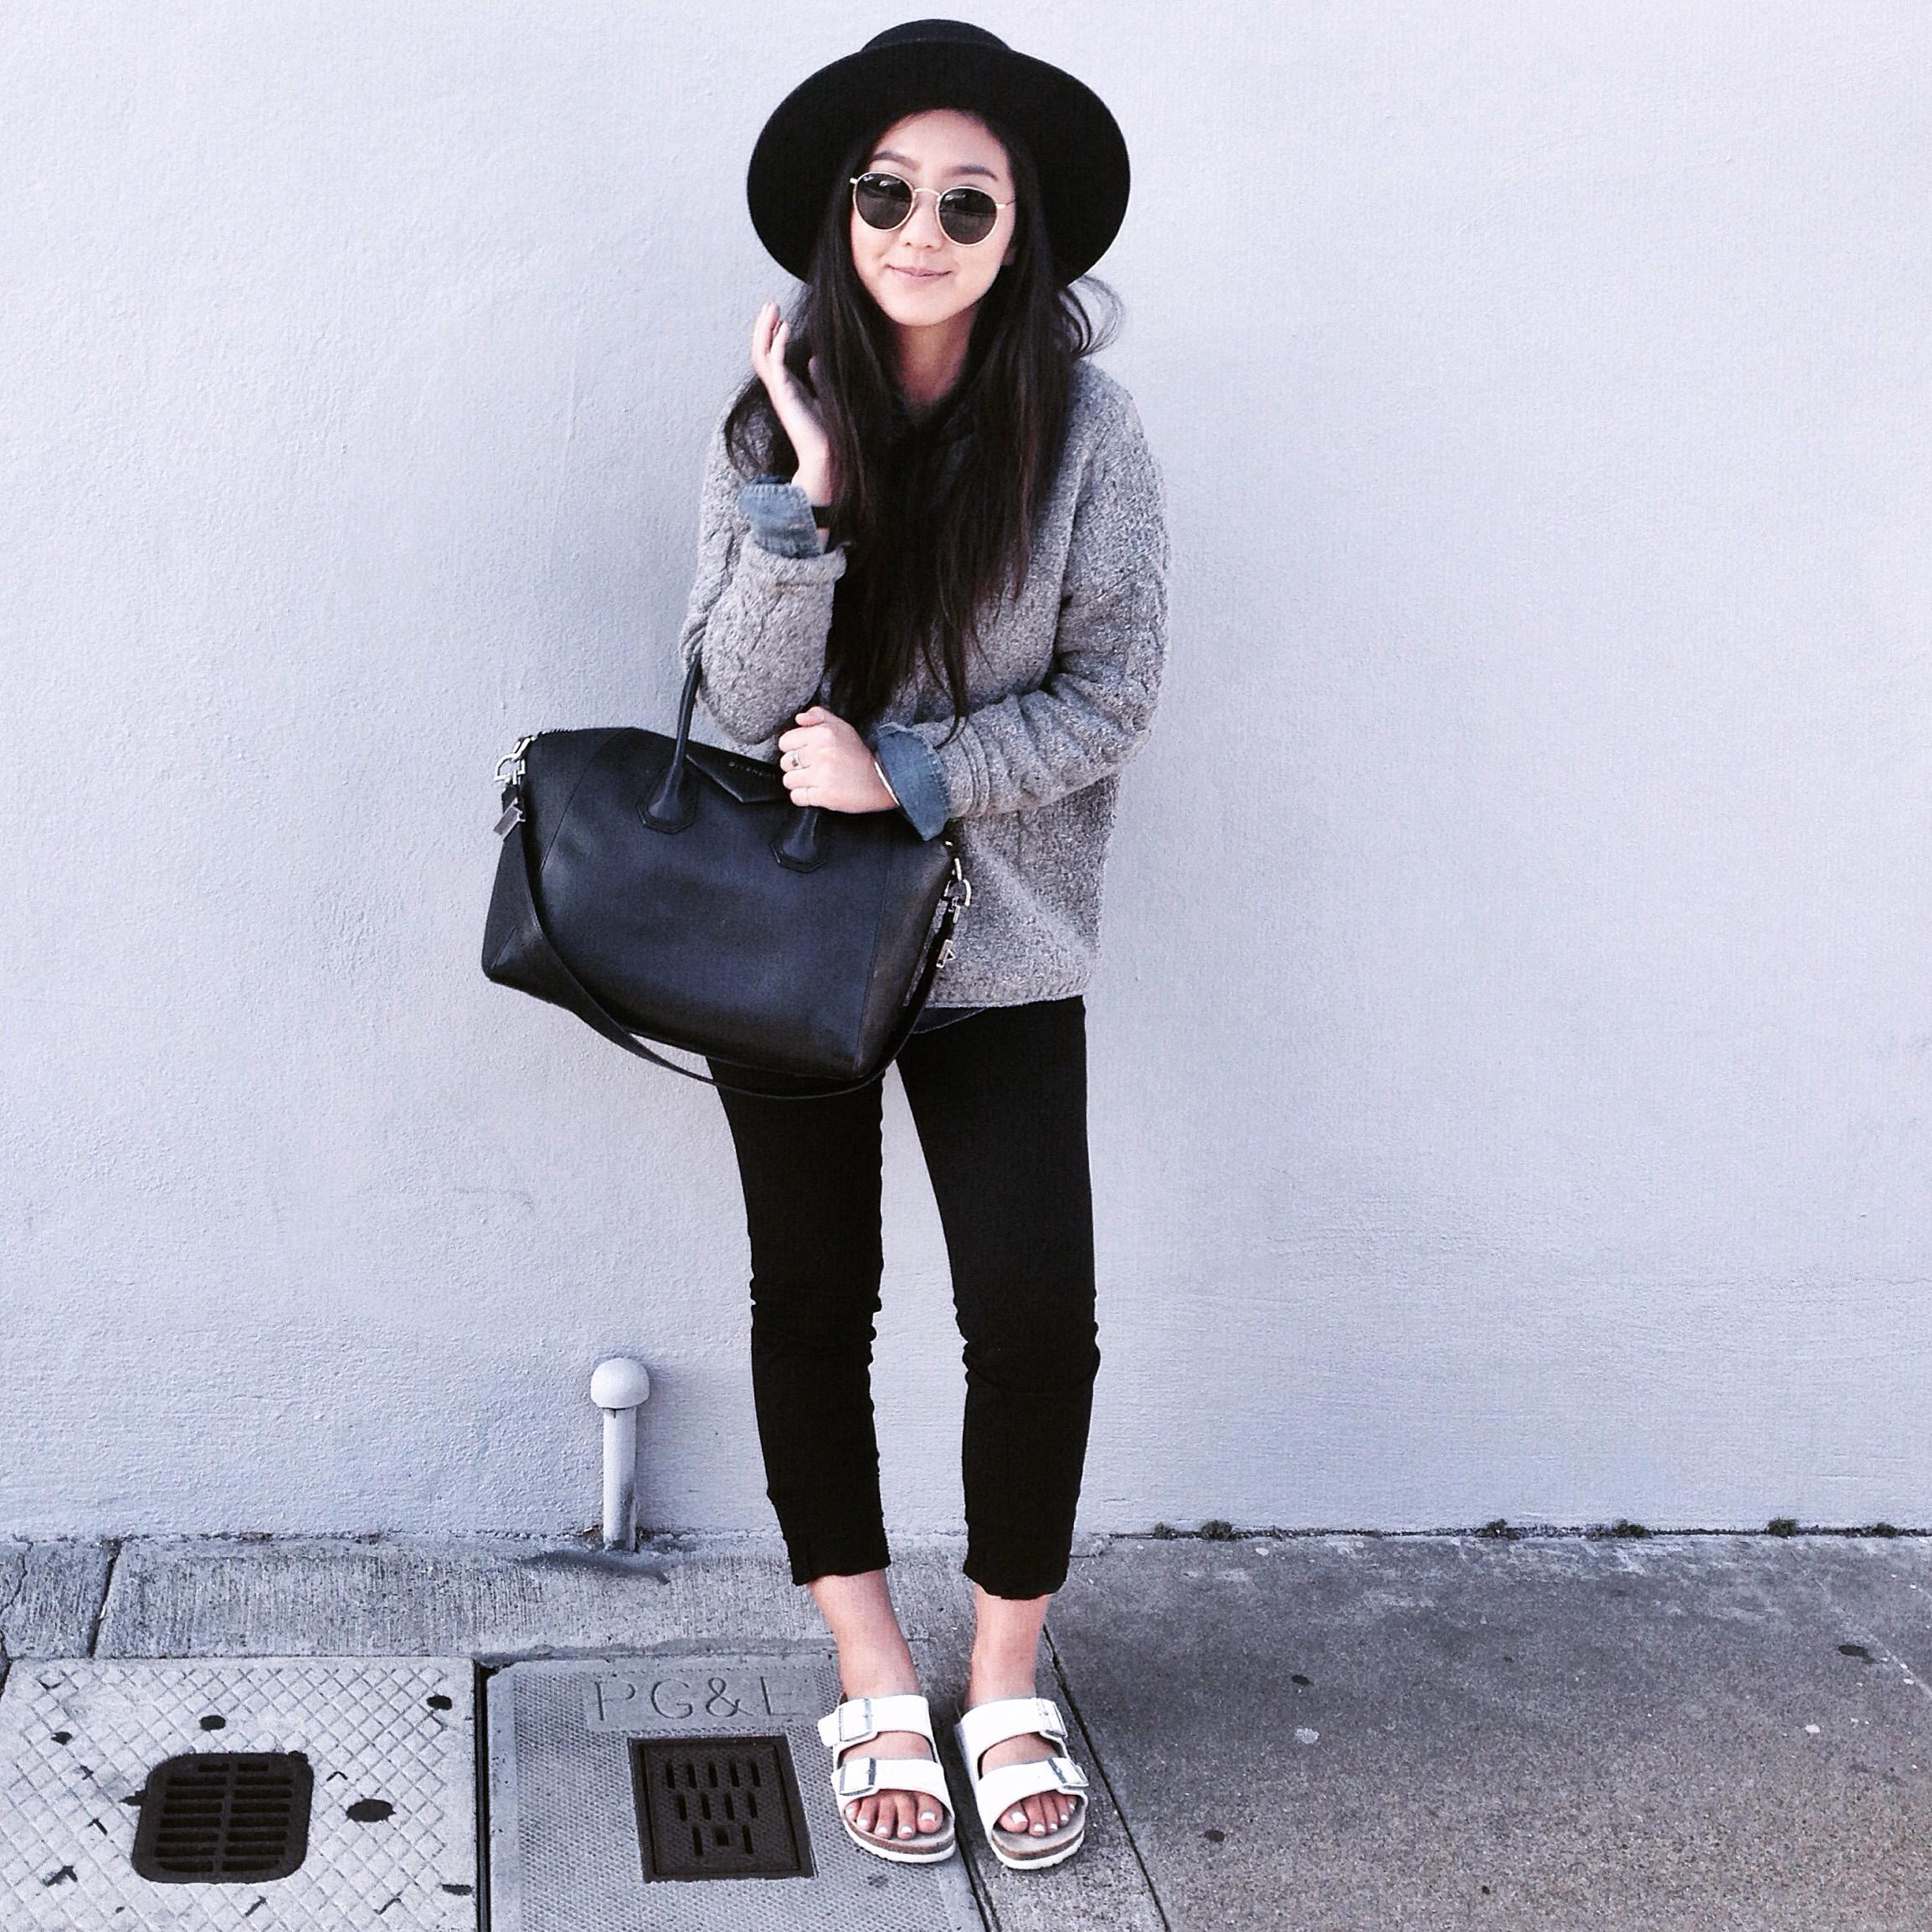 JANESSALEONE   Gabrielle hat   / MADEWELL   cable pullover knit   / ZARA  dress pants  / MADEWELL  denim shirt  /  BIRKENSTOCK   white Arizona sandals